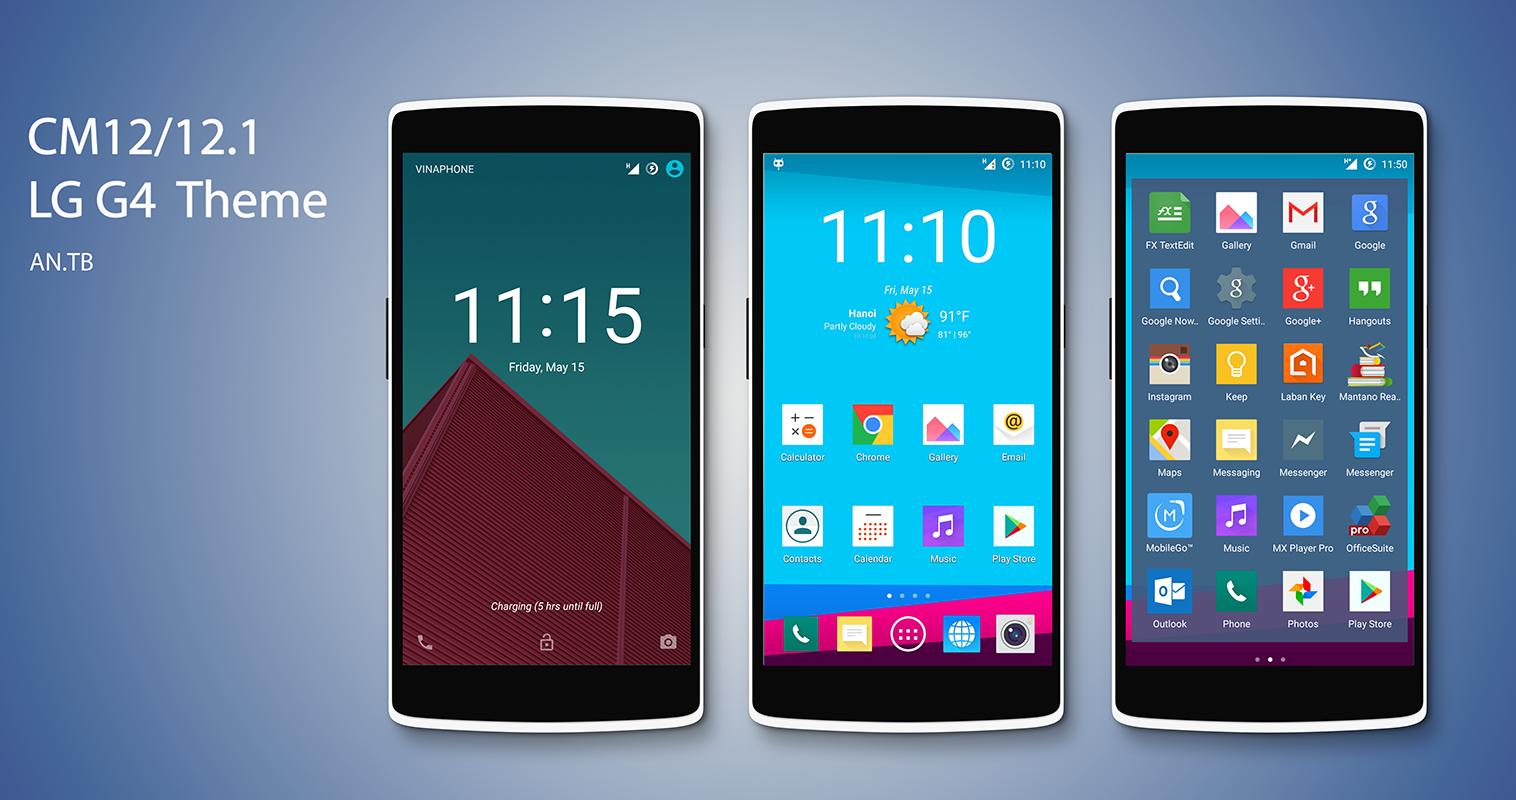 CM12/12.1 LG G4 Theme - screenshot